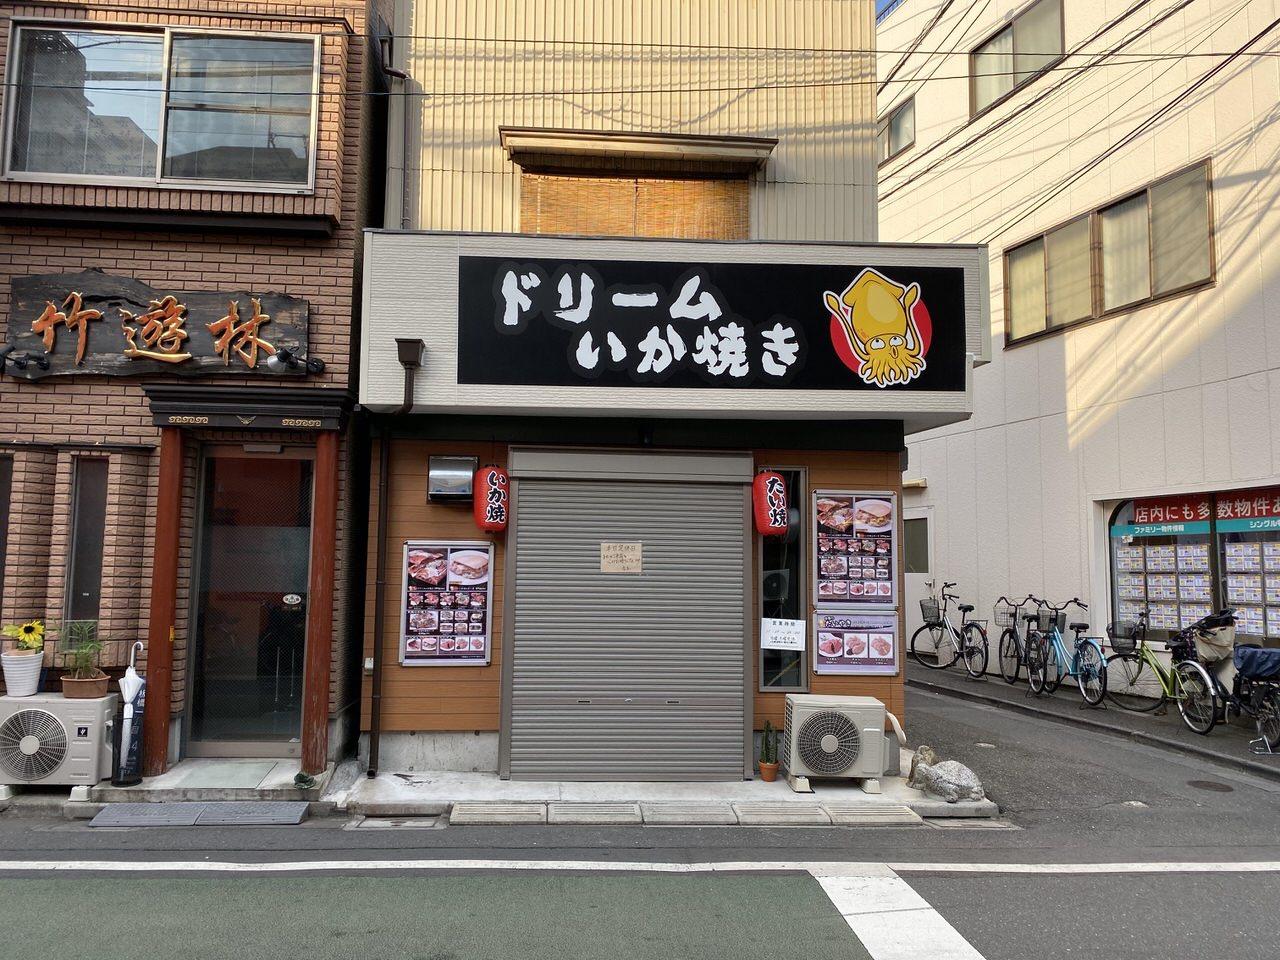 JR板橋駅周辺の酒場 4